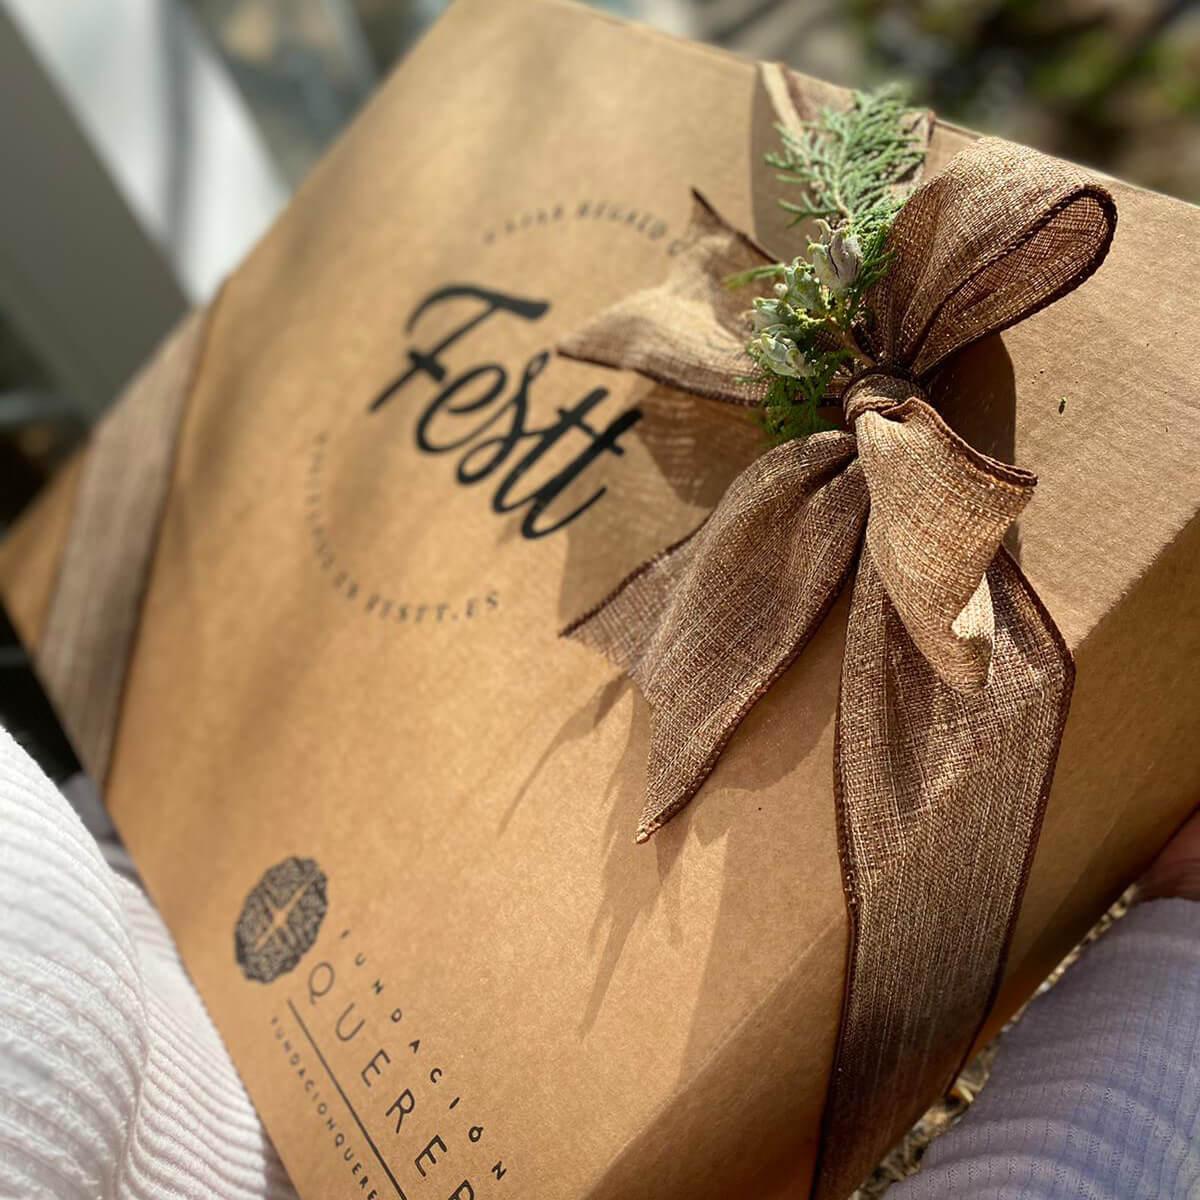 Caja_regalo_gourmet